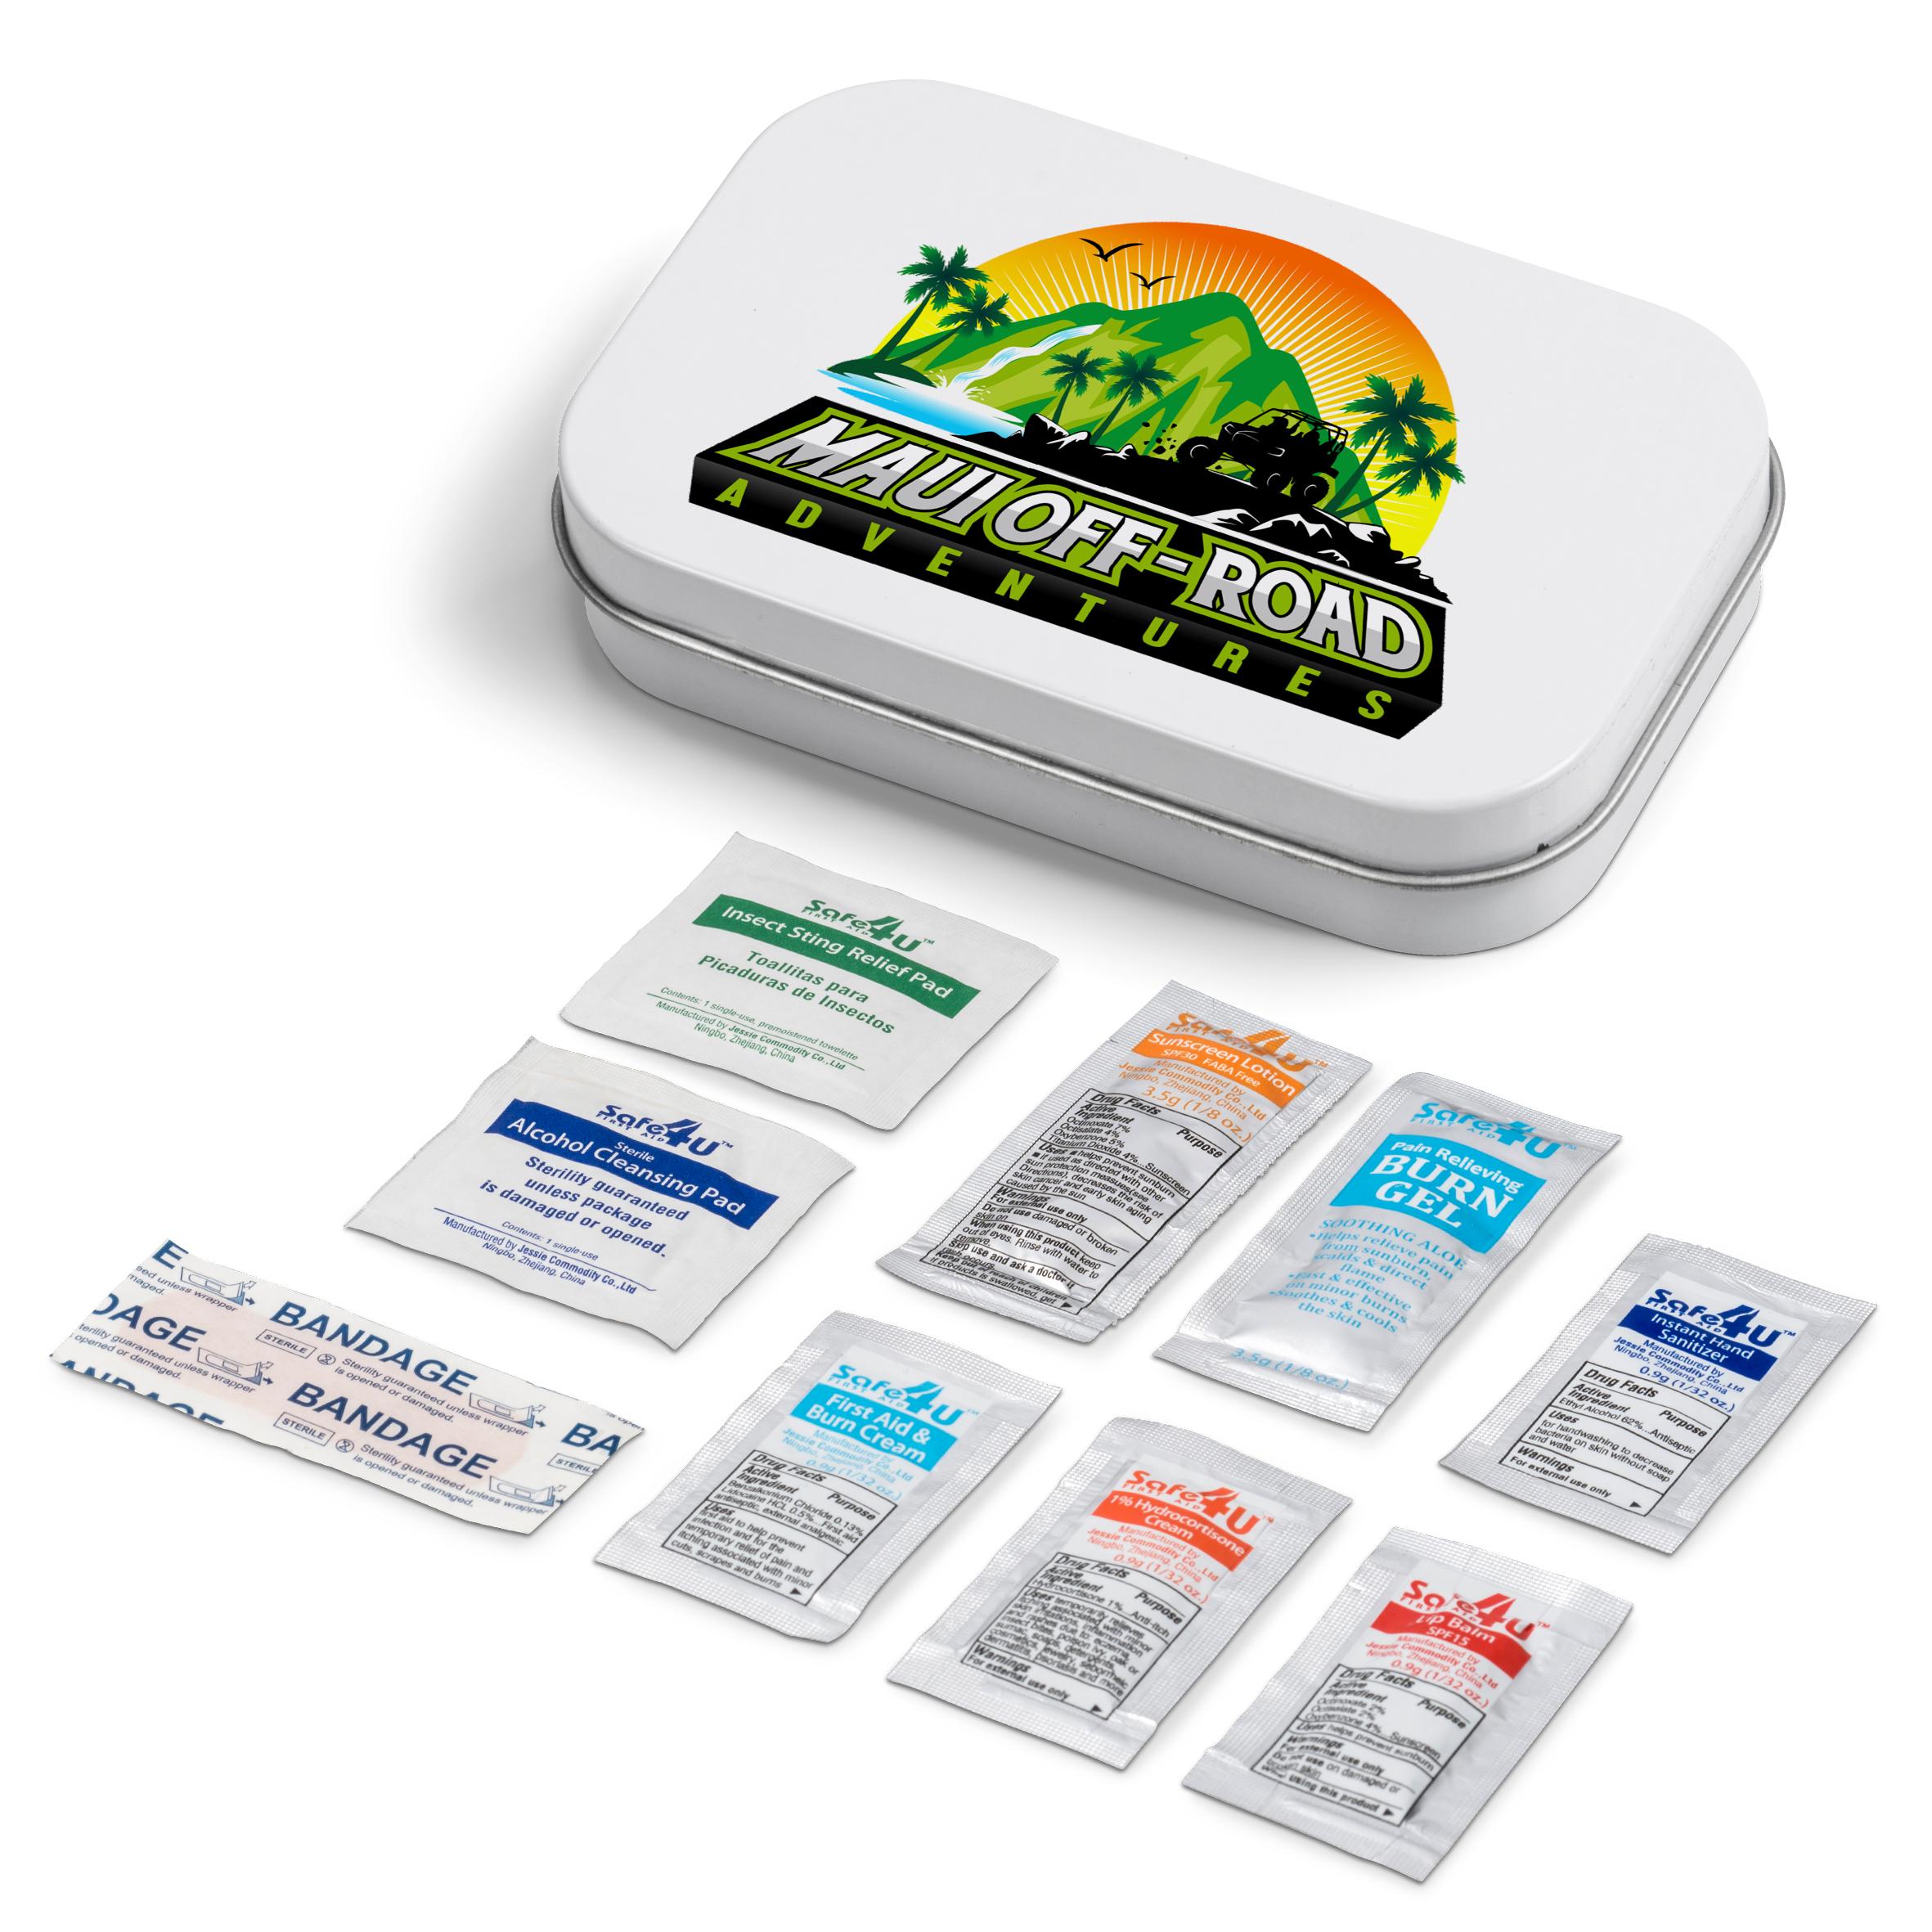 Product: Trek First Aid Kit